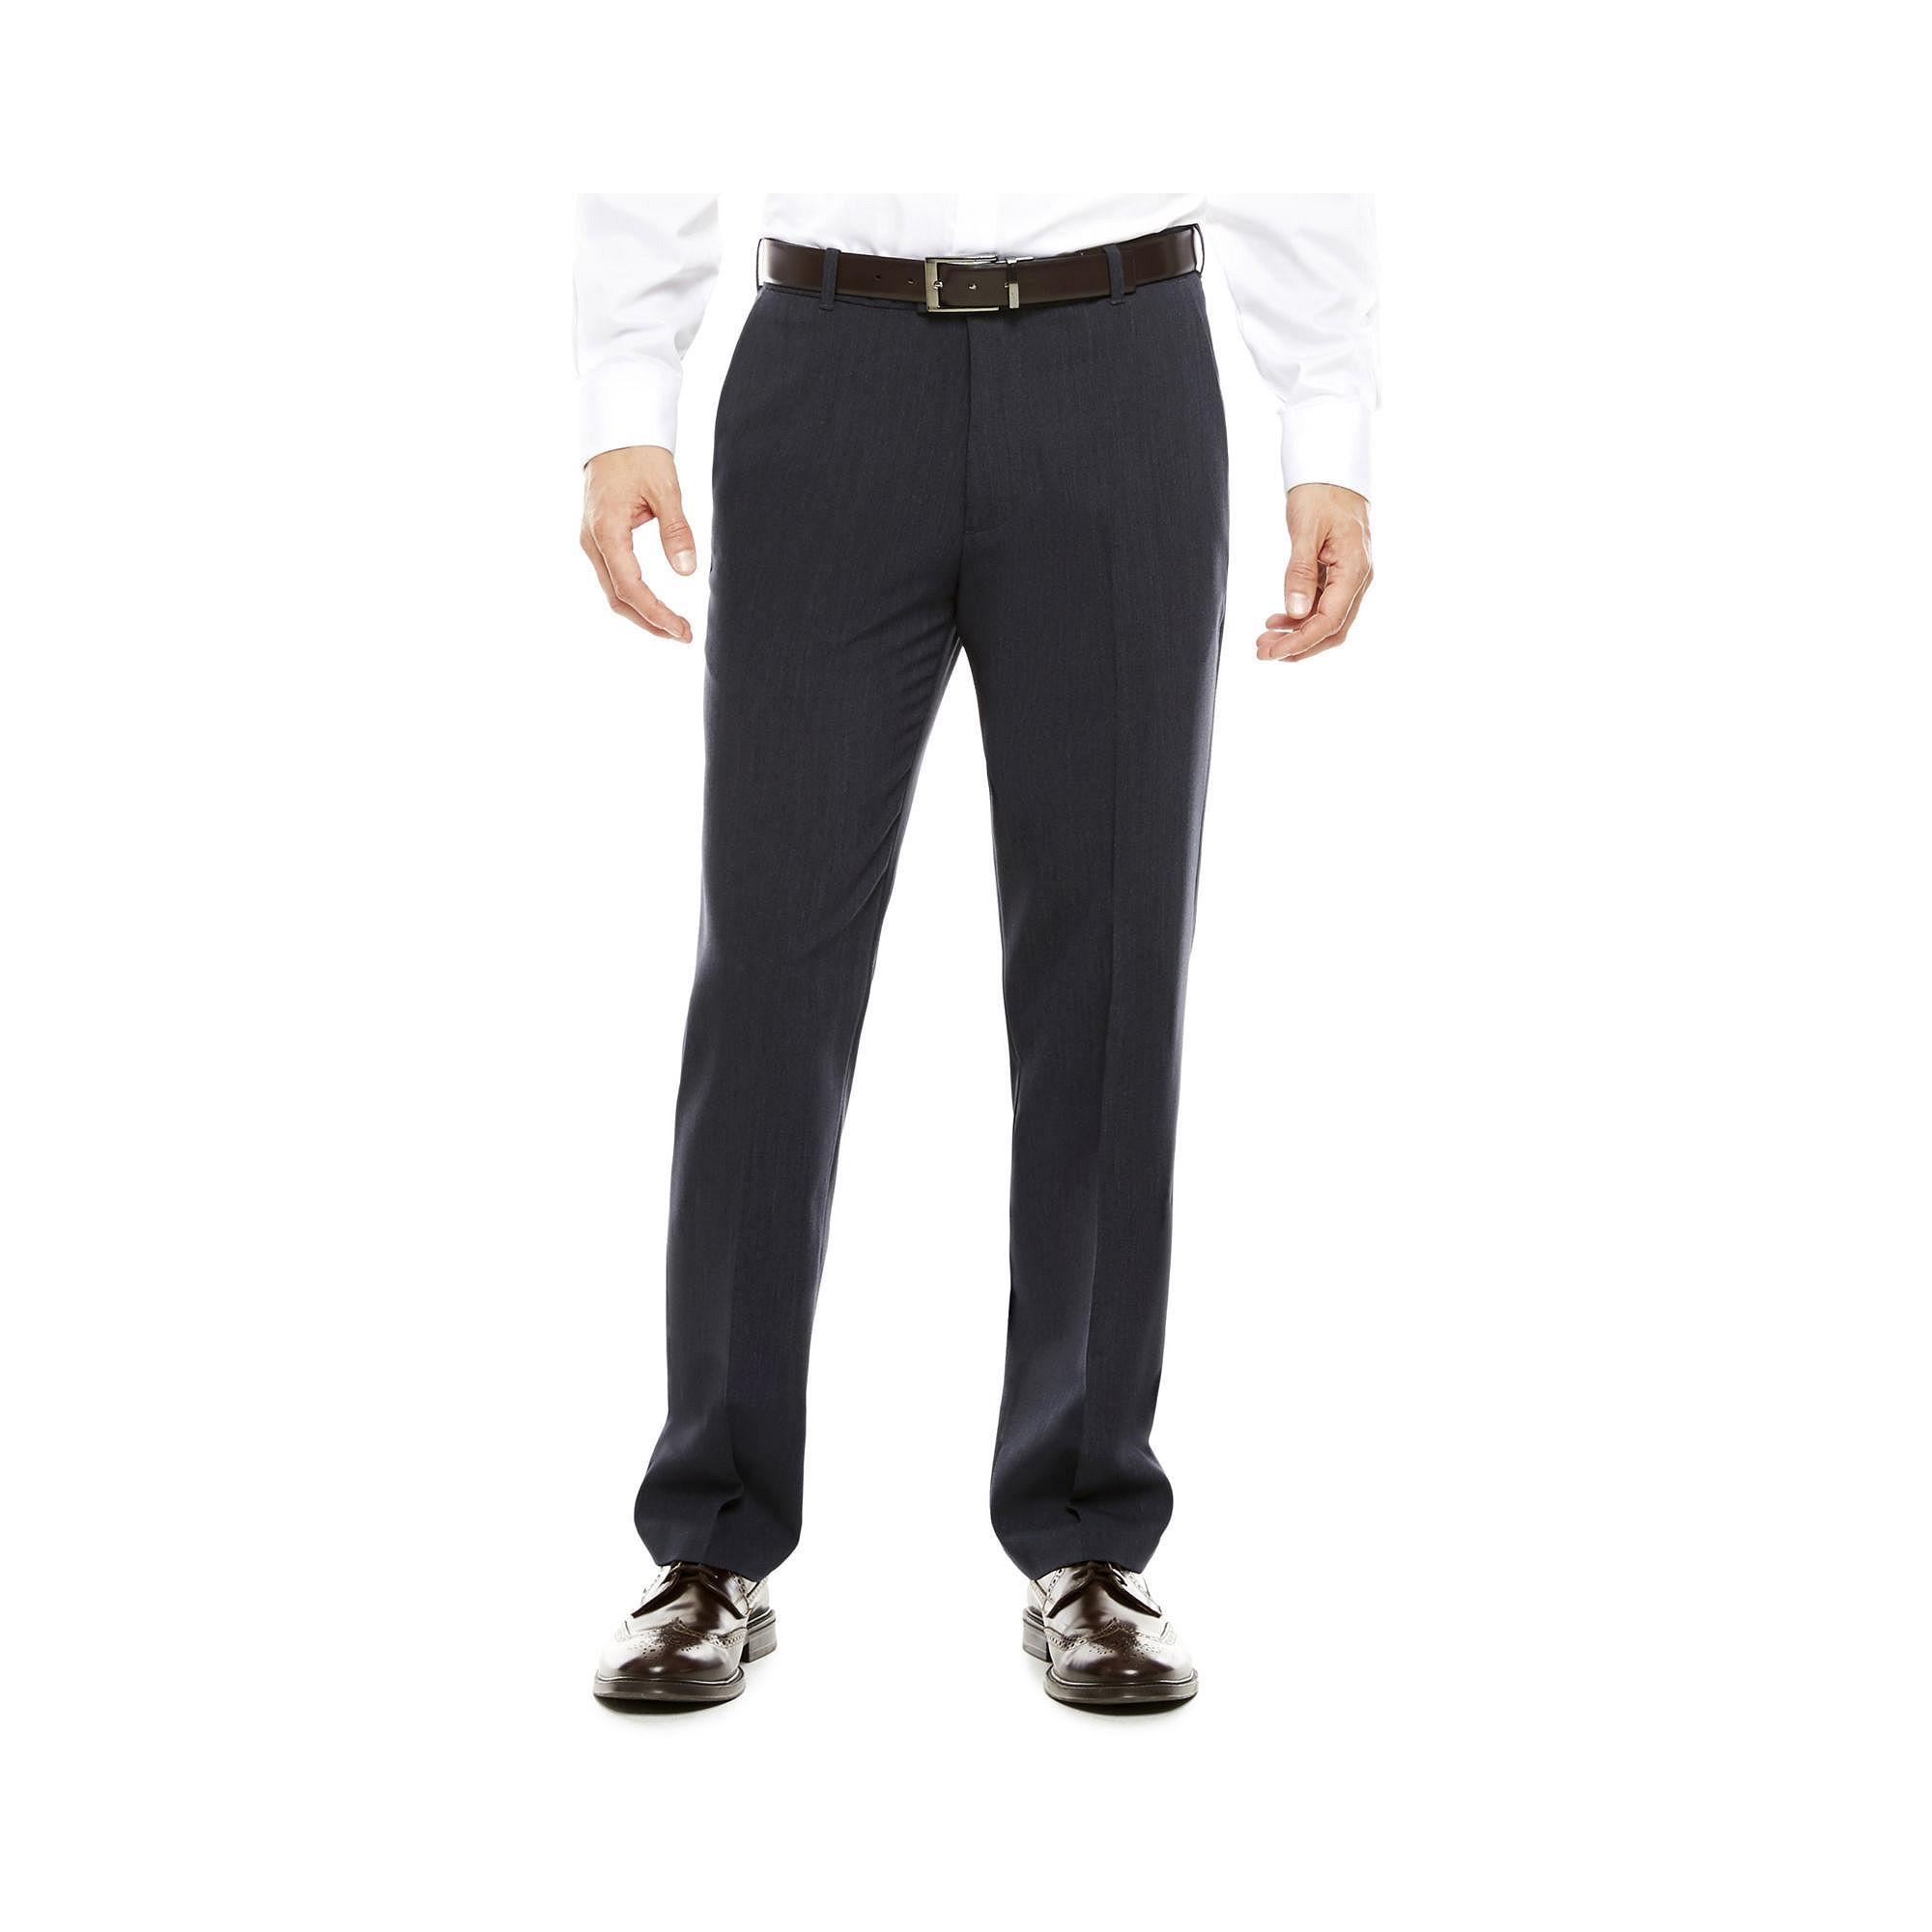 1535cdc320799 UPC 013282970848 - Van Heusen Flex Flat-Front Pants | upcitemdb.com